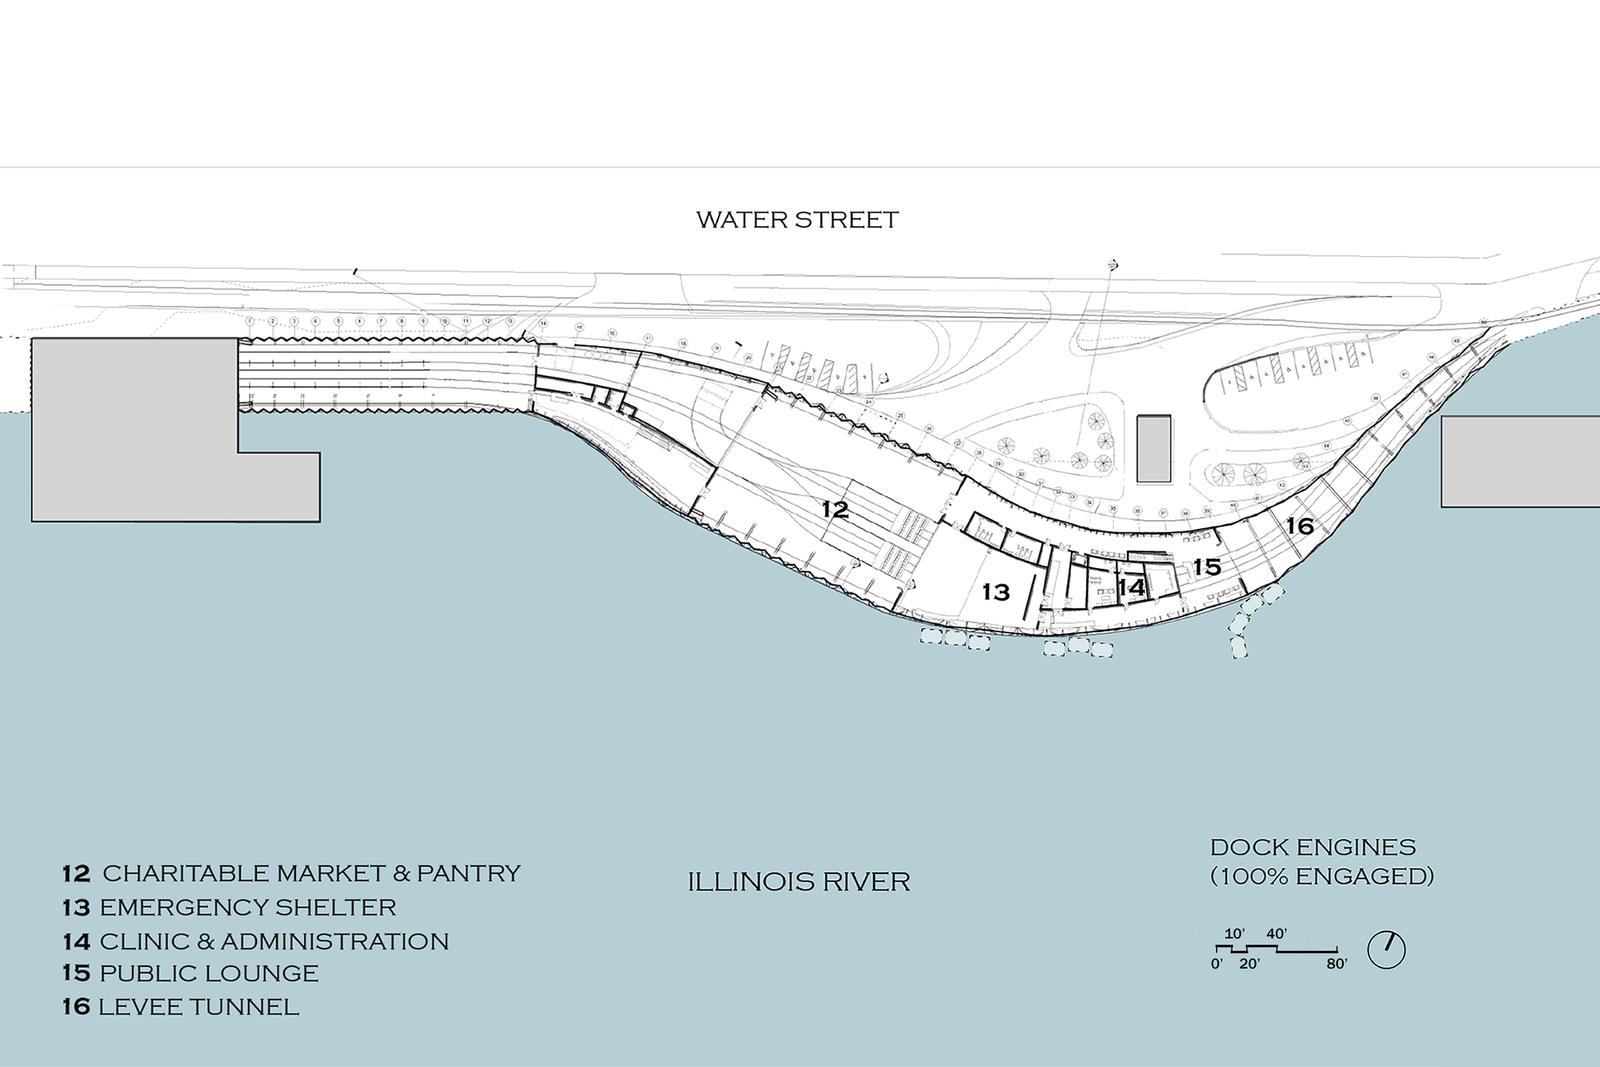 Plan Sequence 3 Major Flood